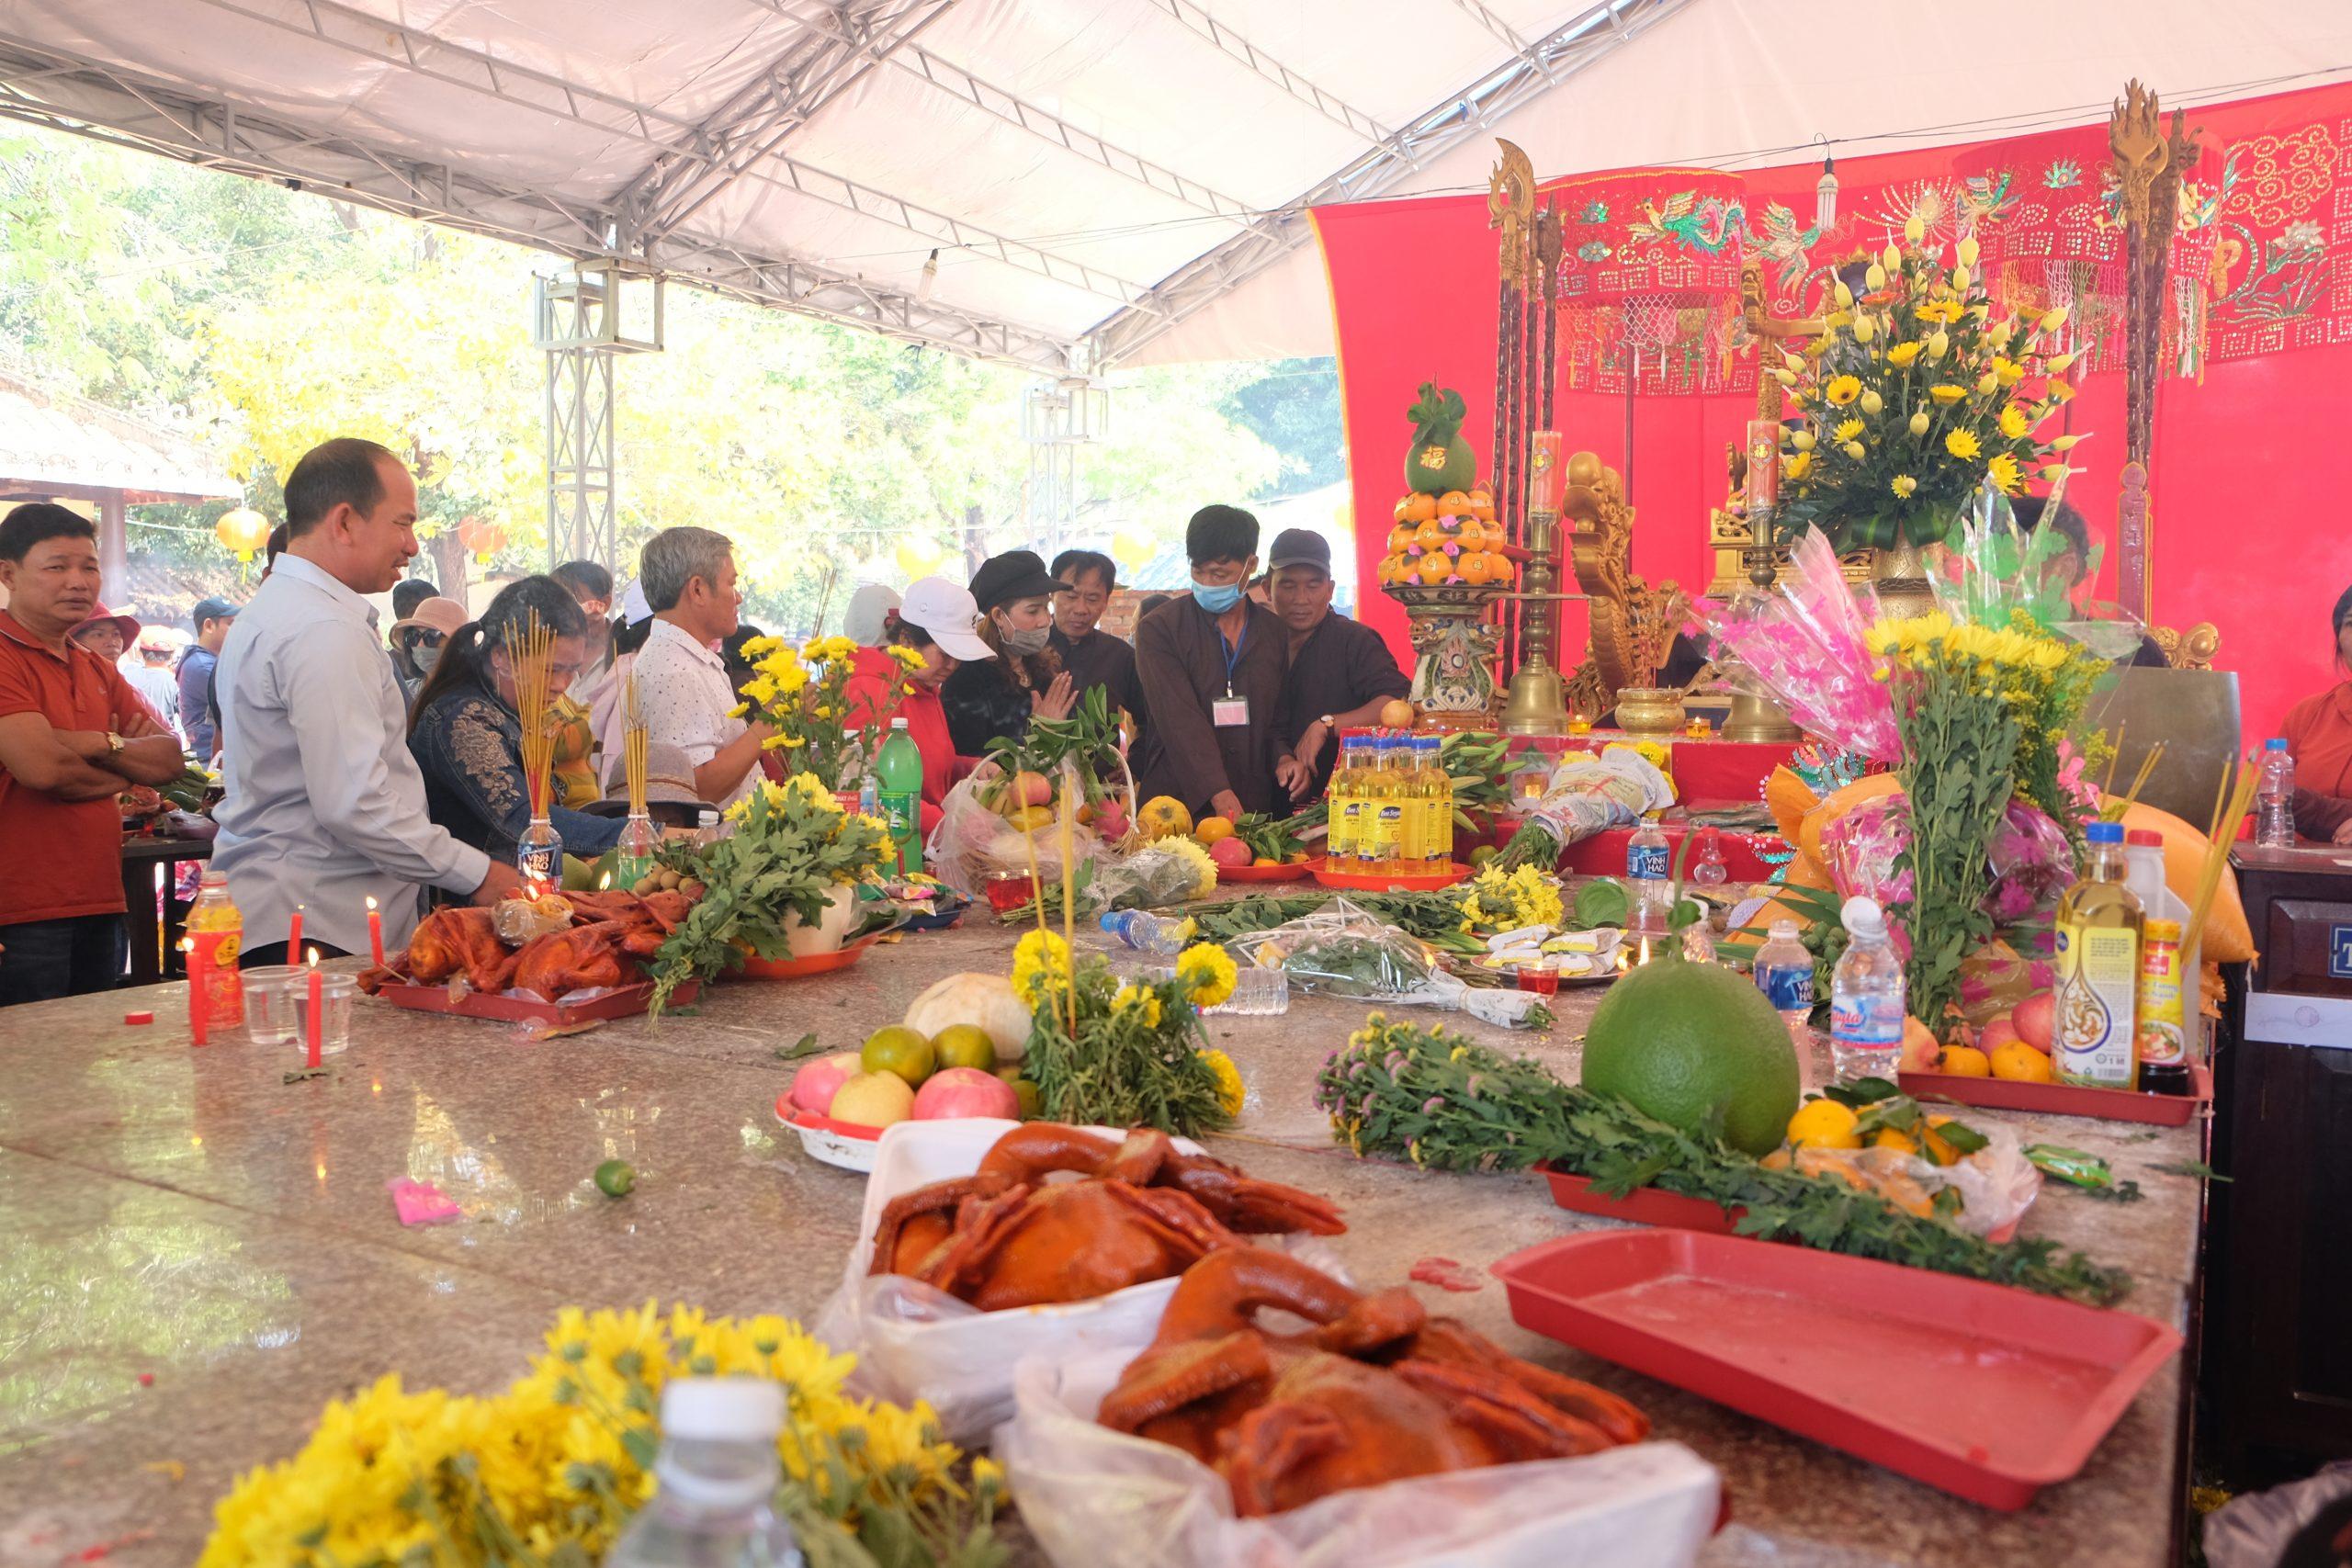 Le hoi dinh Thay Thim 2020 – 12